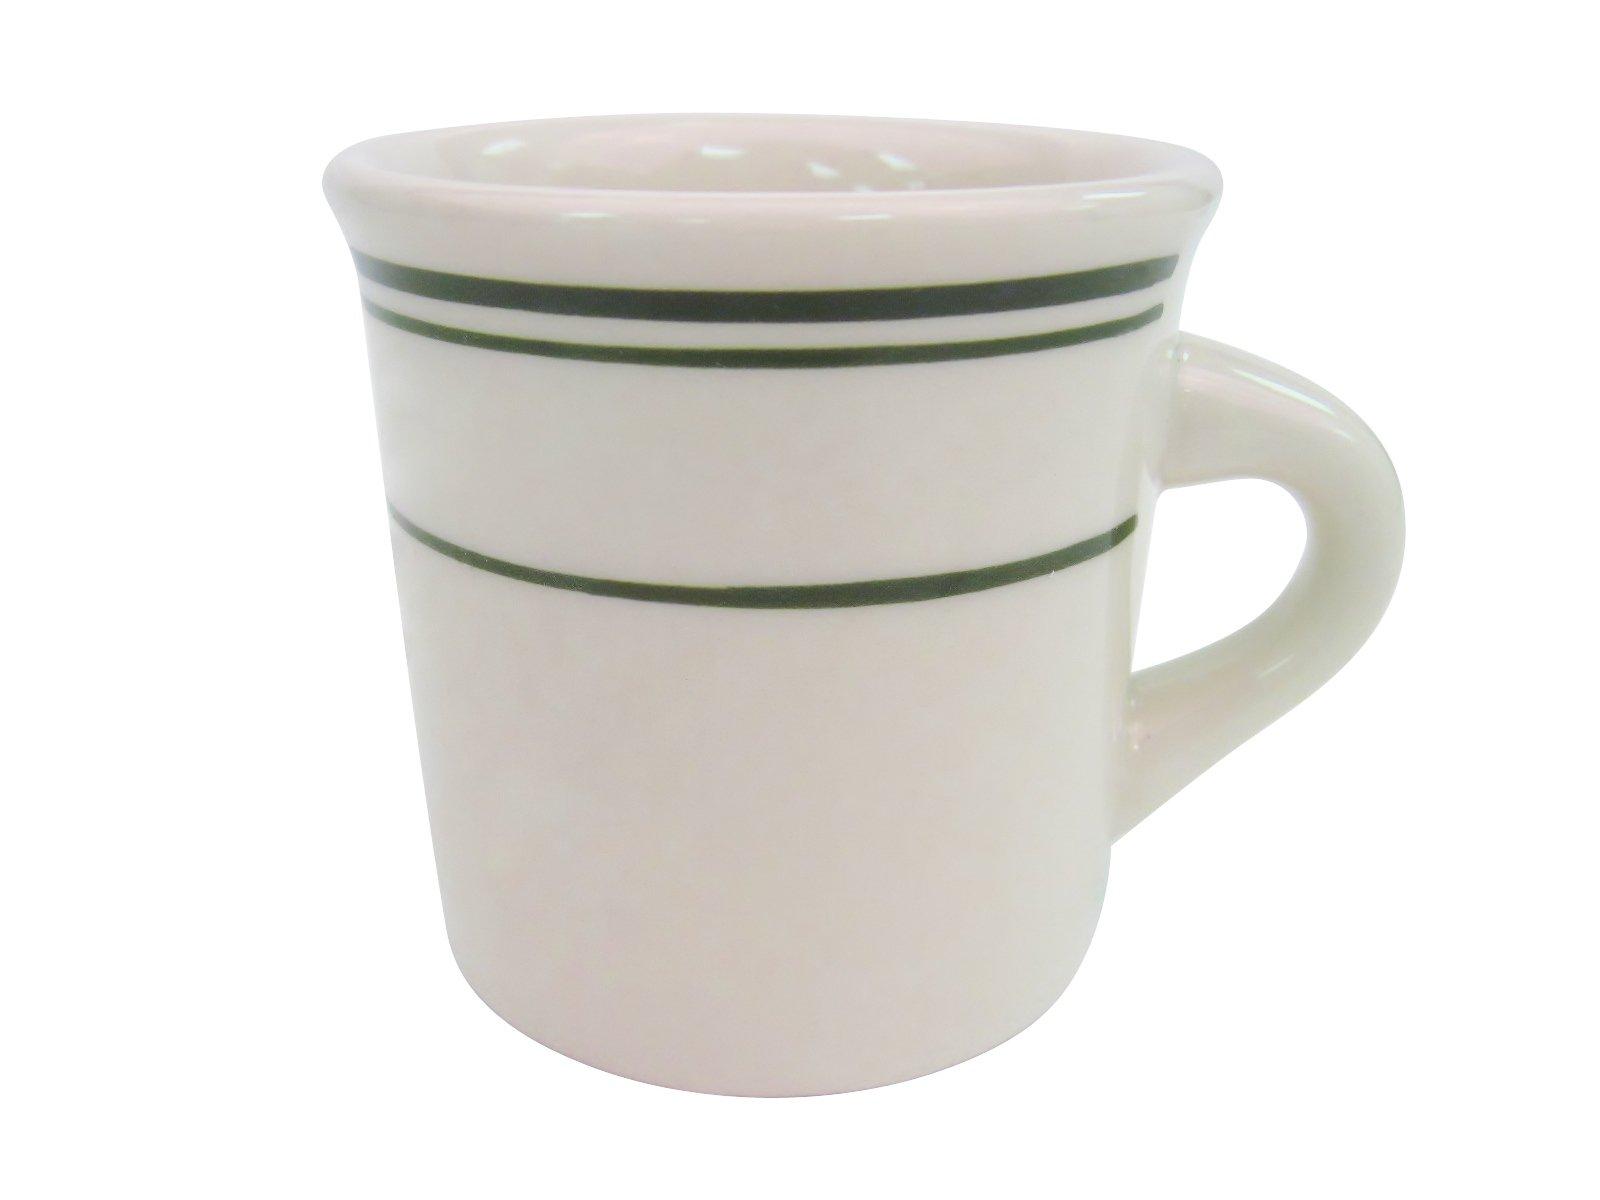 CAC China GS-38 3-3/8-Inch Greenbrier 8-Ounce Green Band Stoneware Mug, American White, Box of 36